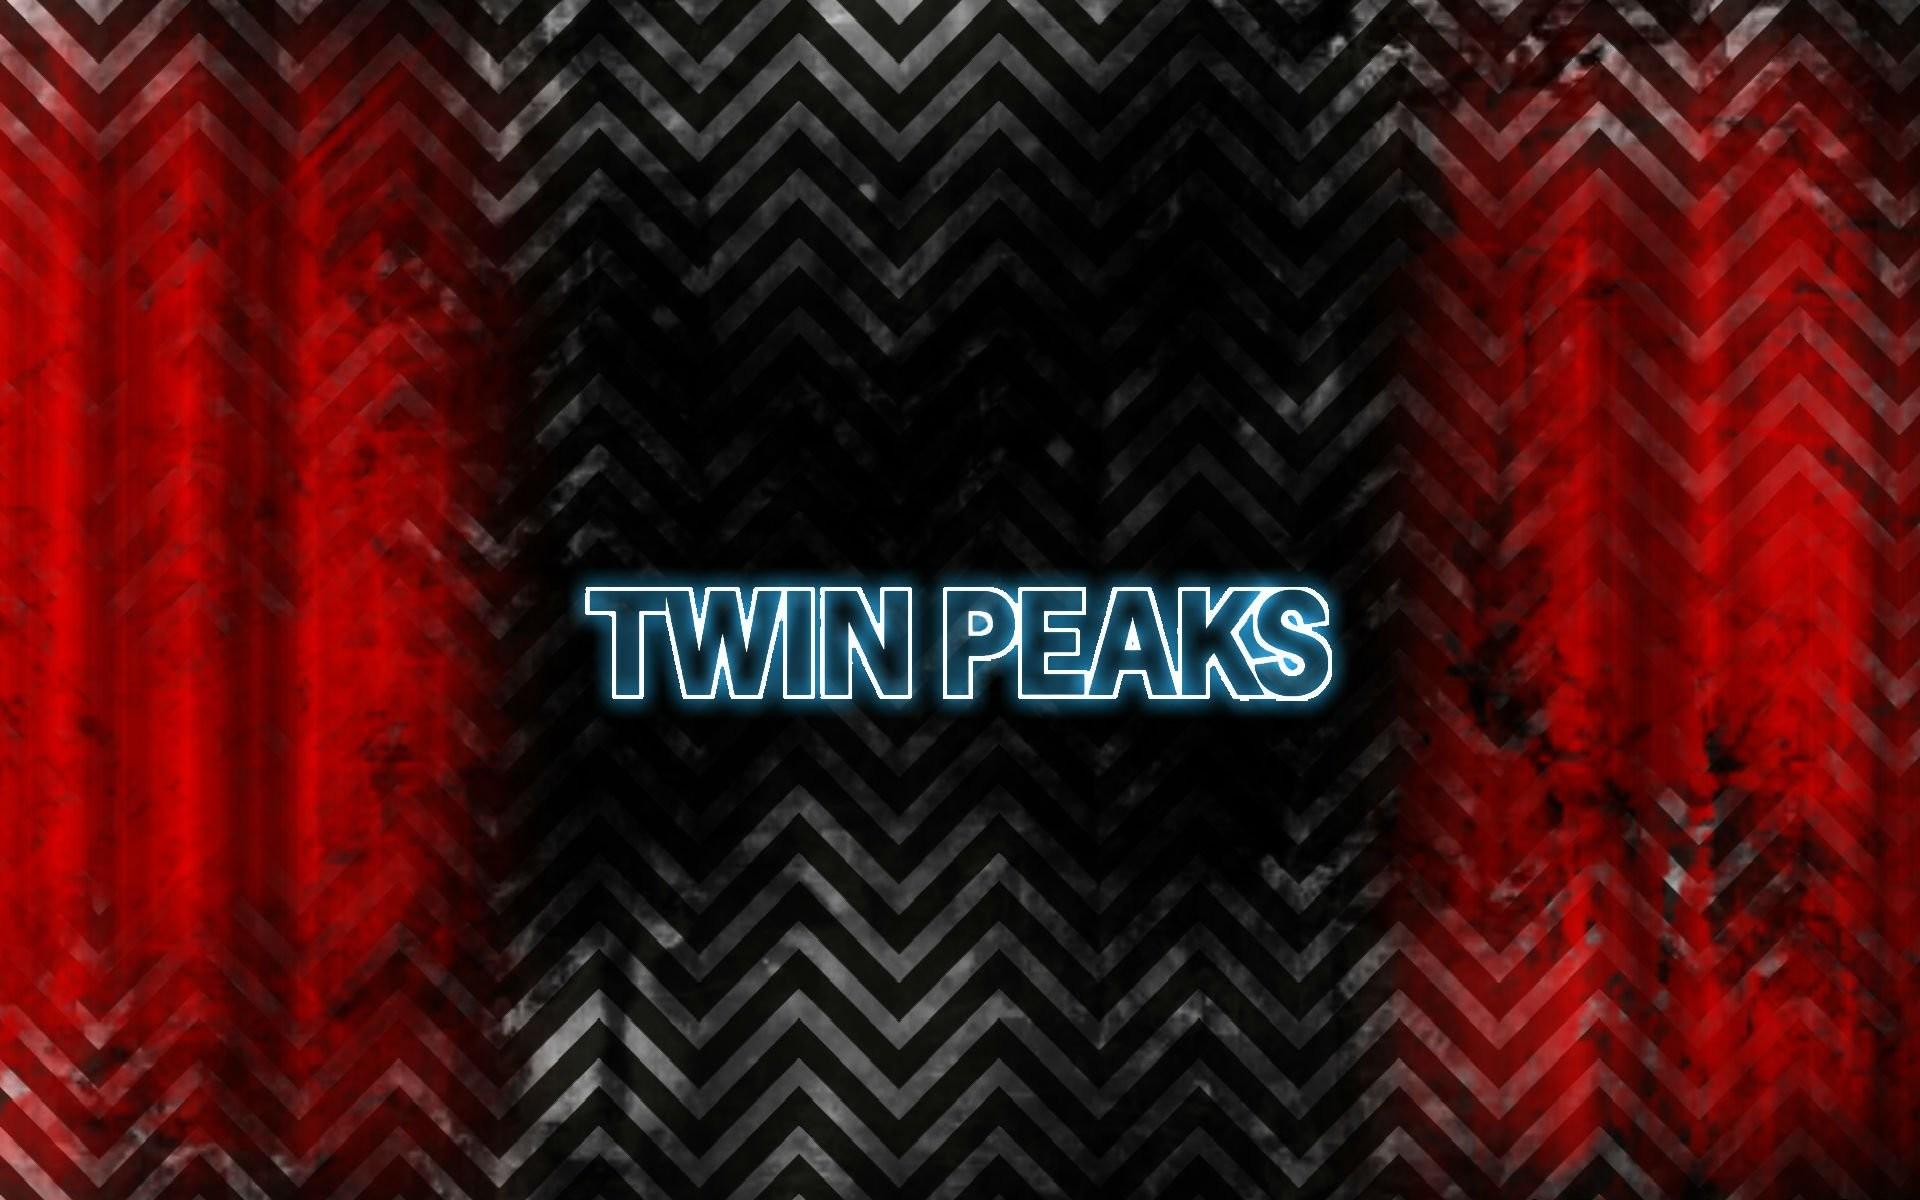 TWIN PEAKS crime drama series mystery fbi 1peaks horror poster wallpaper |  | 939310 | WallpaperUP